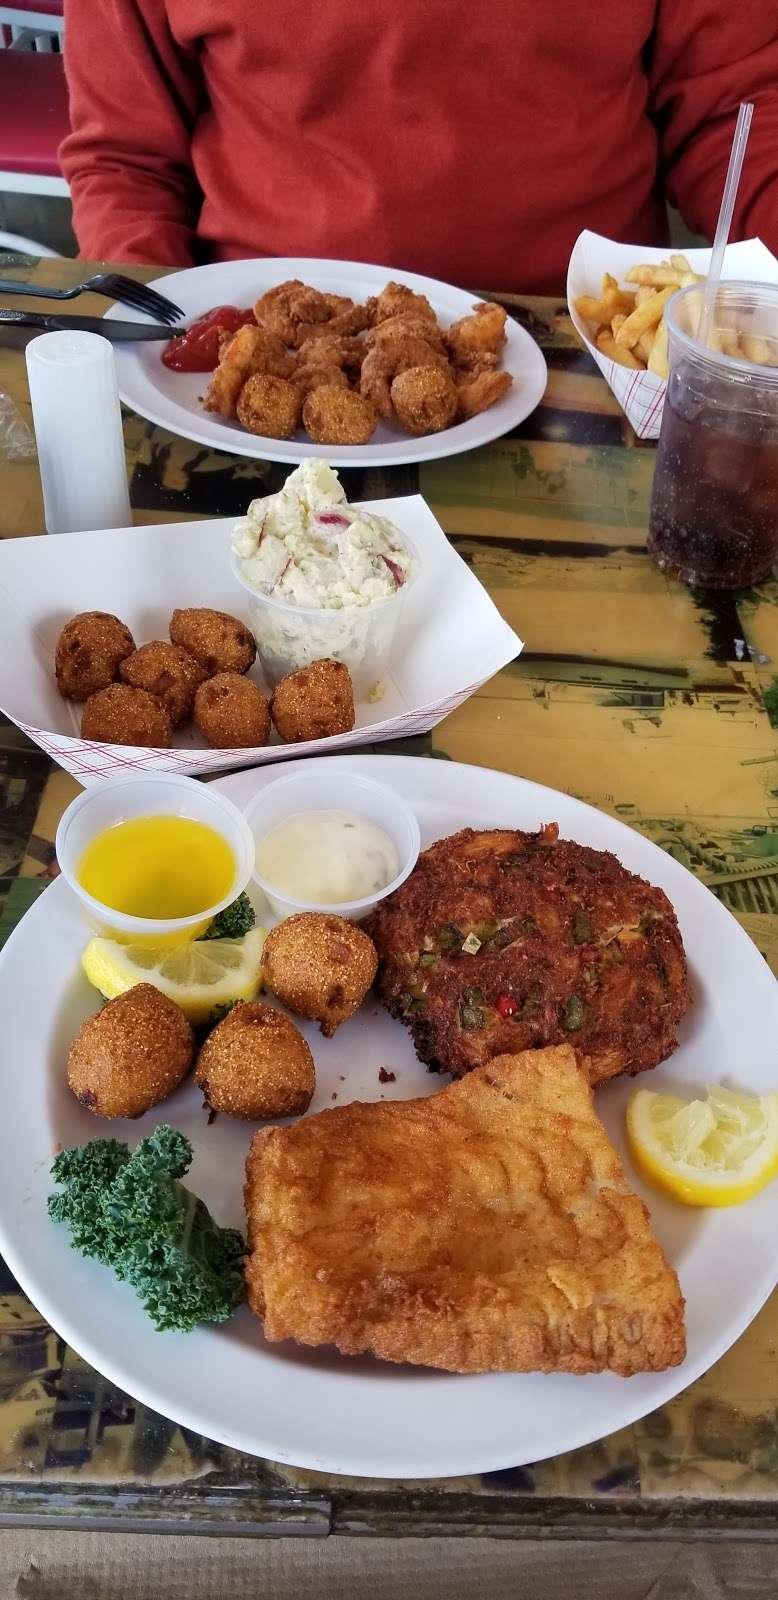 Tims Rivershore Restaurant and Crabhouse - restaurant  | Photo 9 of 10 | Address: 1510 Cherry Hill Rd, Dumfries, VA 22026, USA | Phone: (703) 441-1375